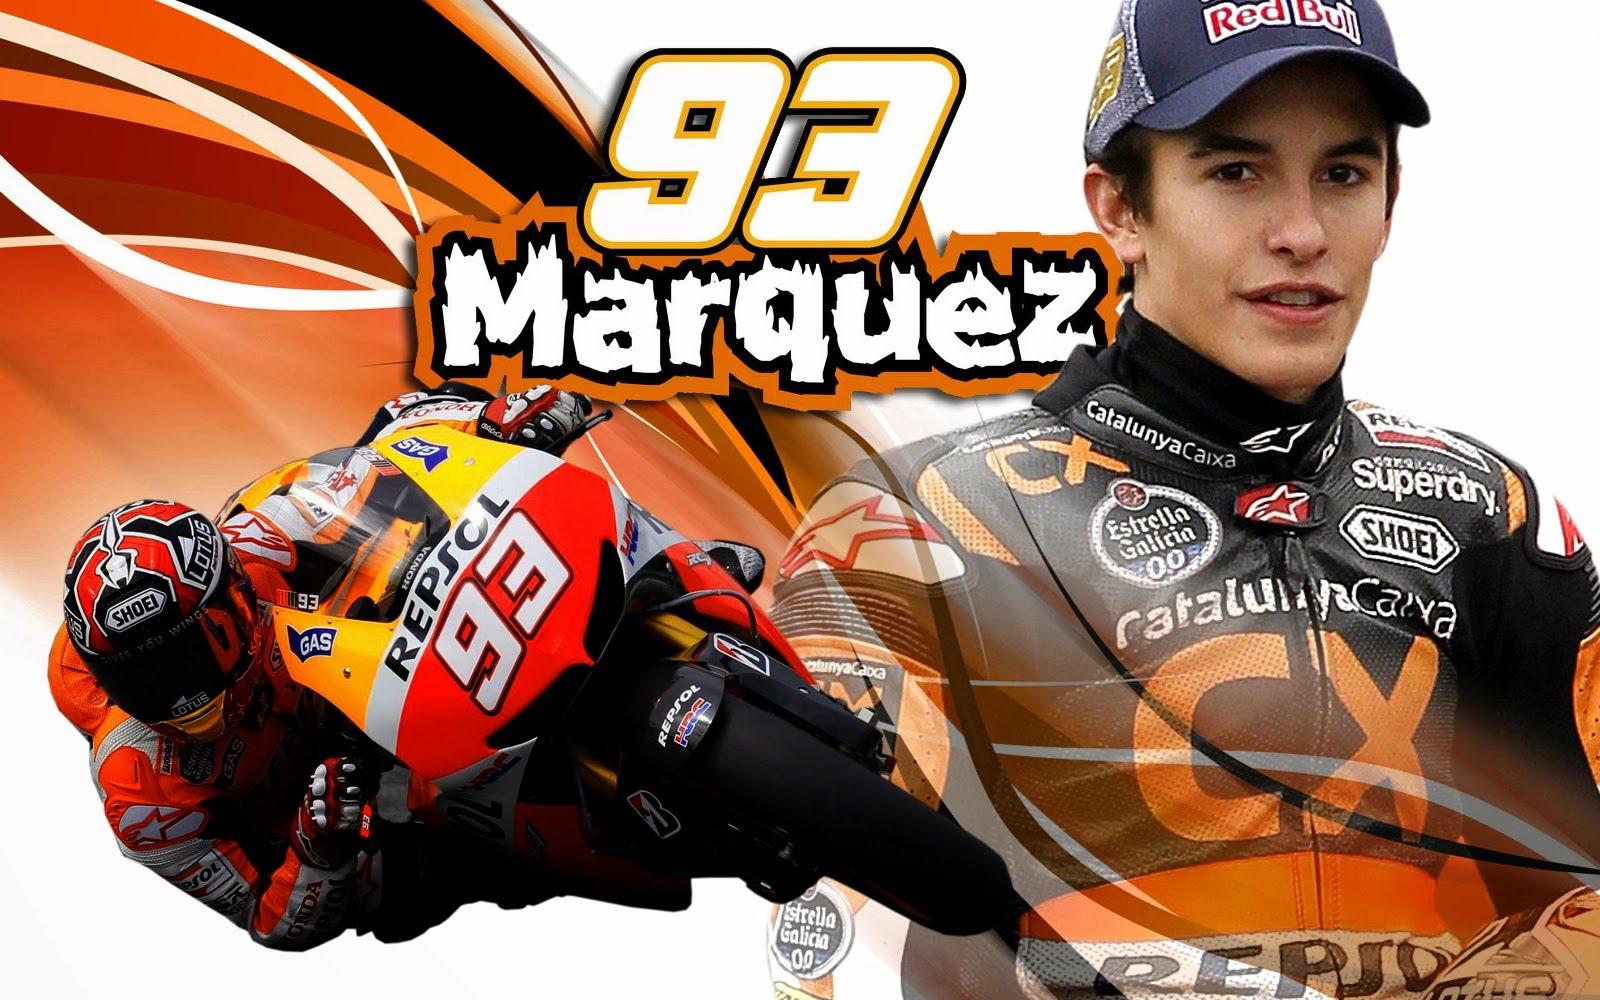 Pihak KTM Akan Segera Mengajukan Penawaran Untuk Marquez